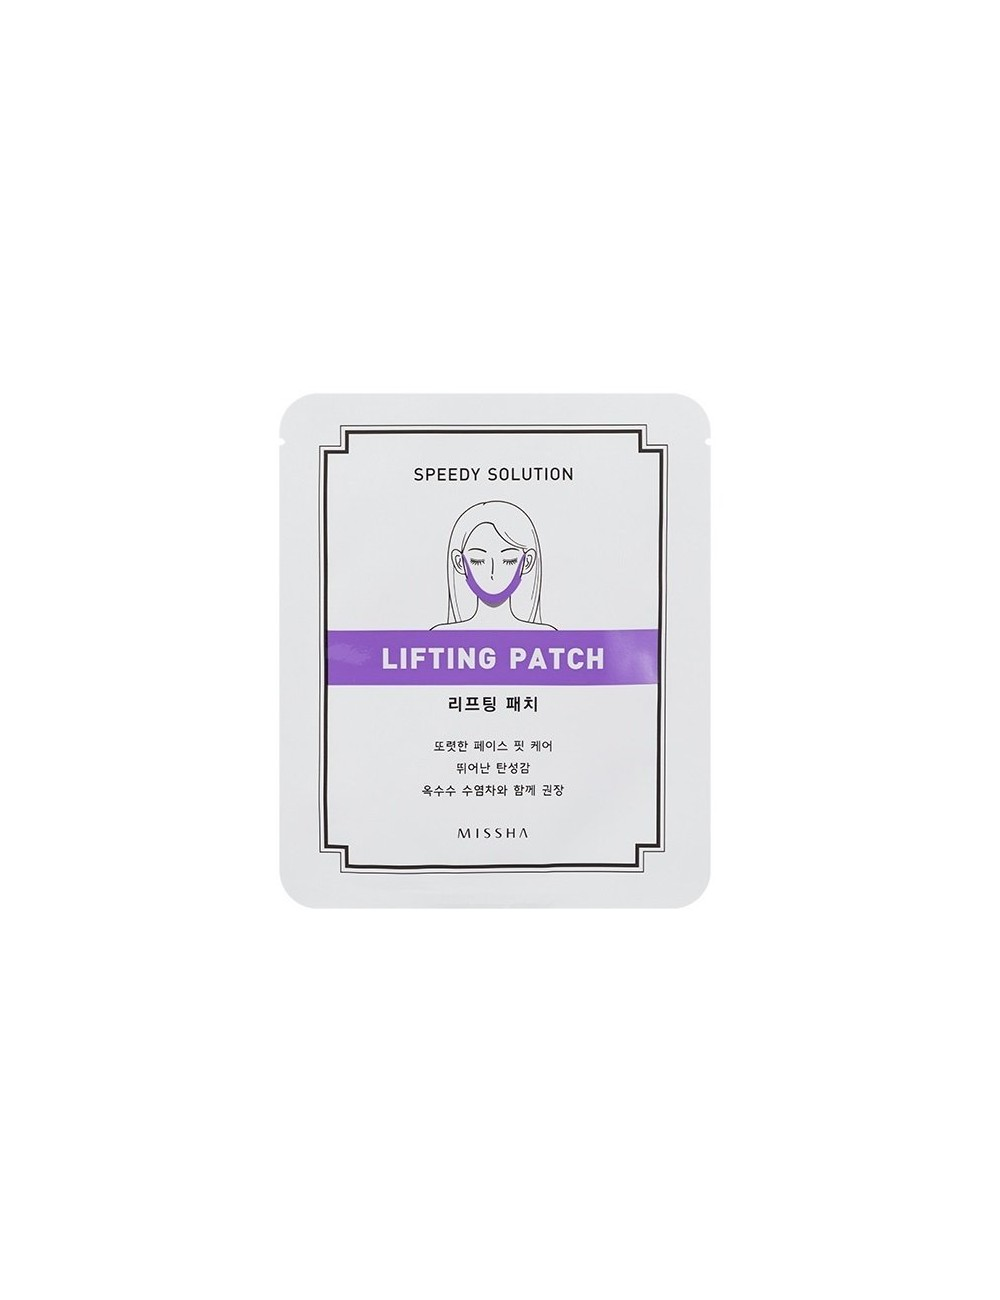 Parche Reafirmante de Óvalo Facial  MISSHA Speedy Solution Lifting Patch